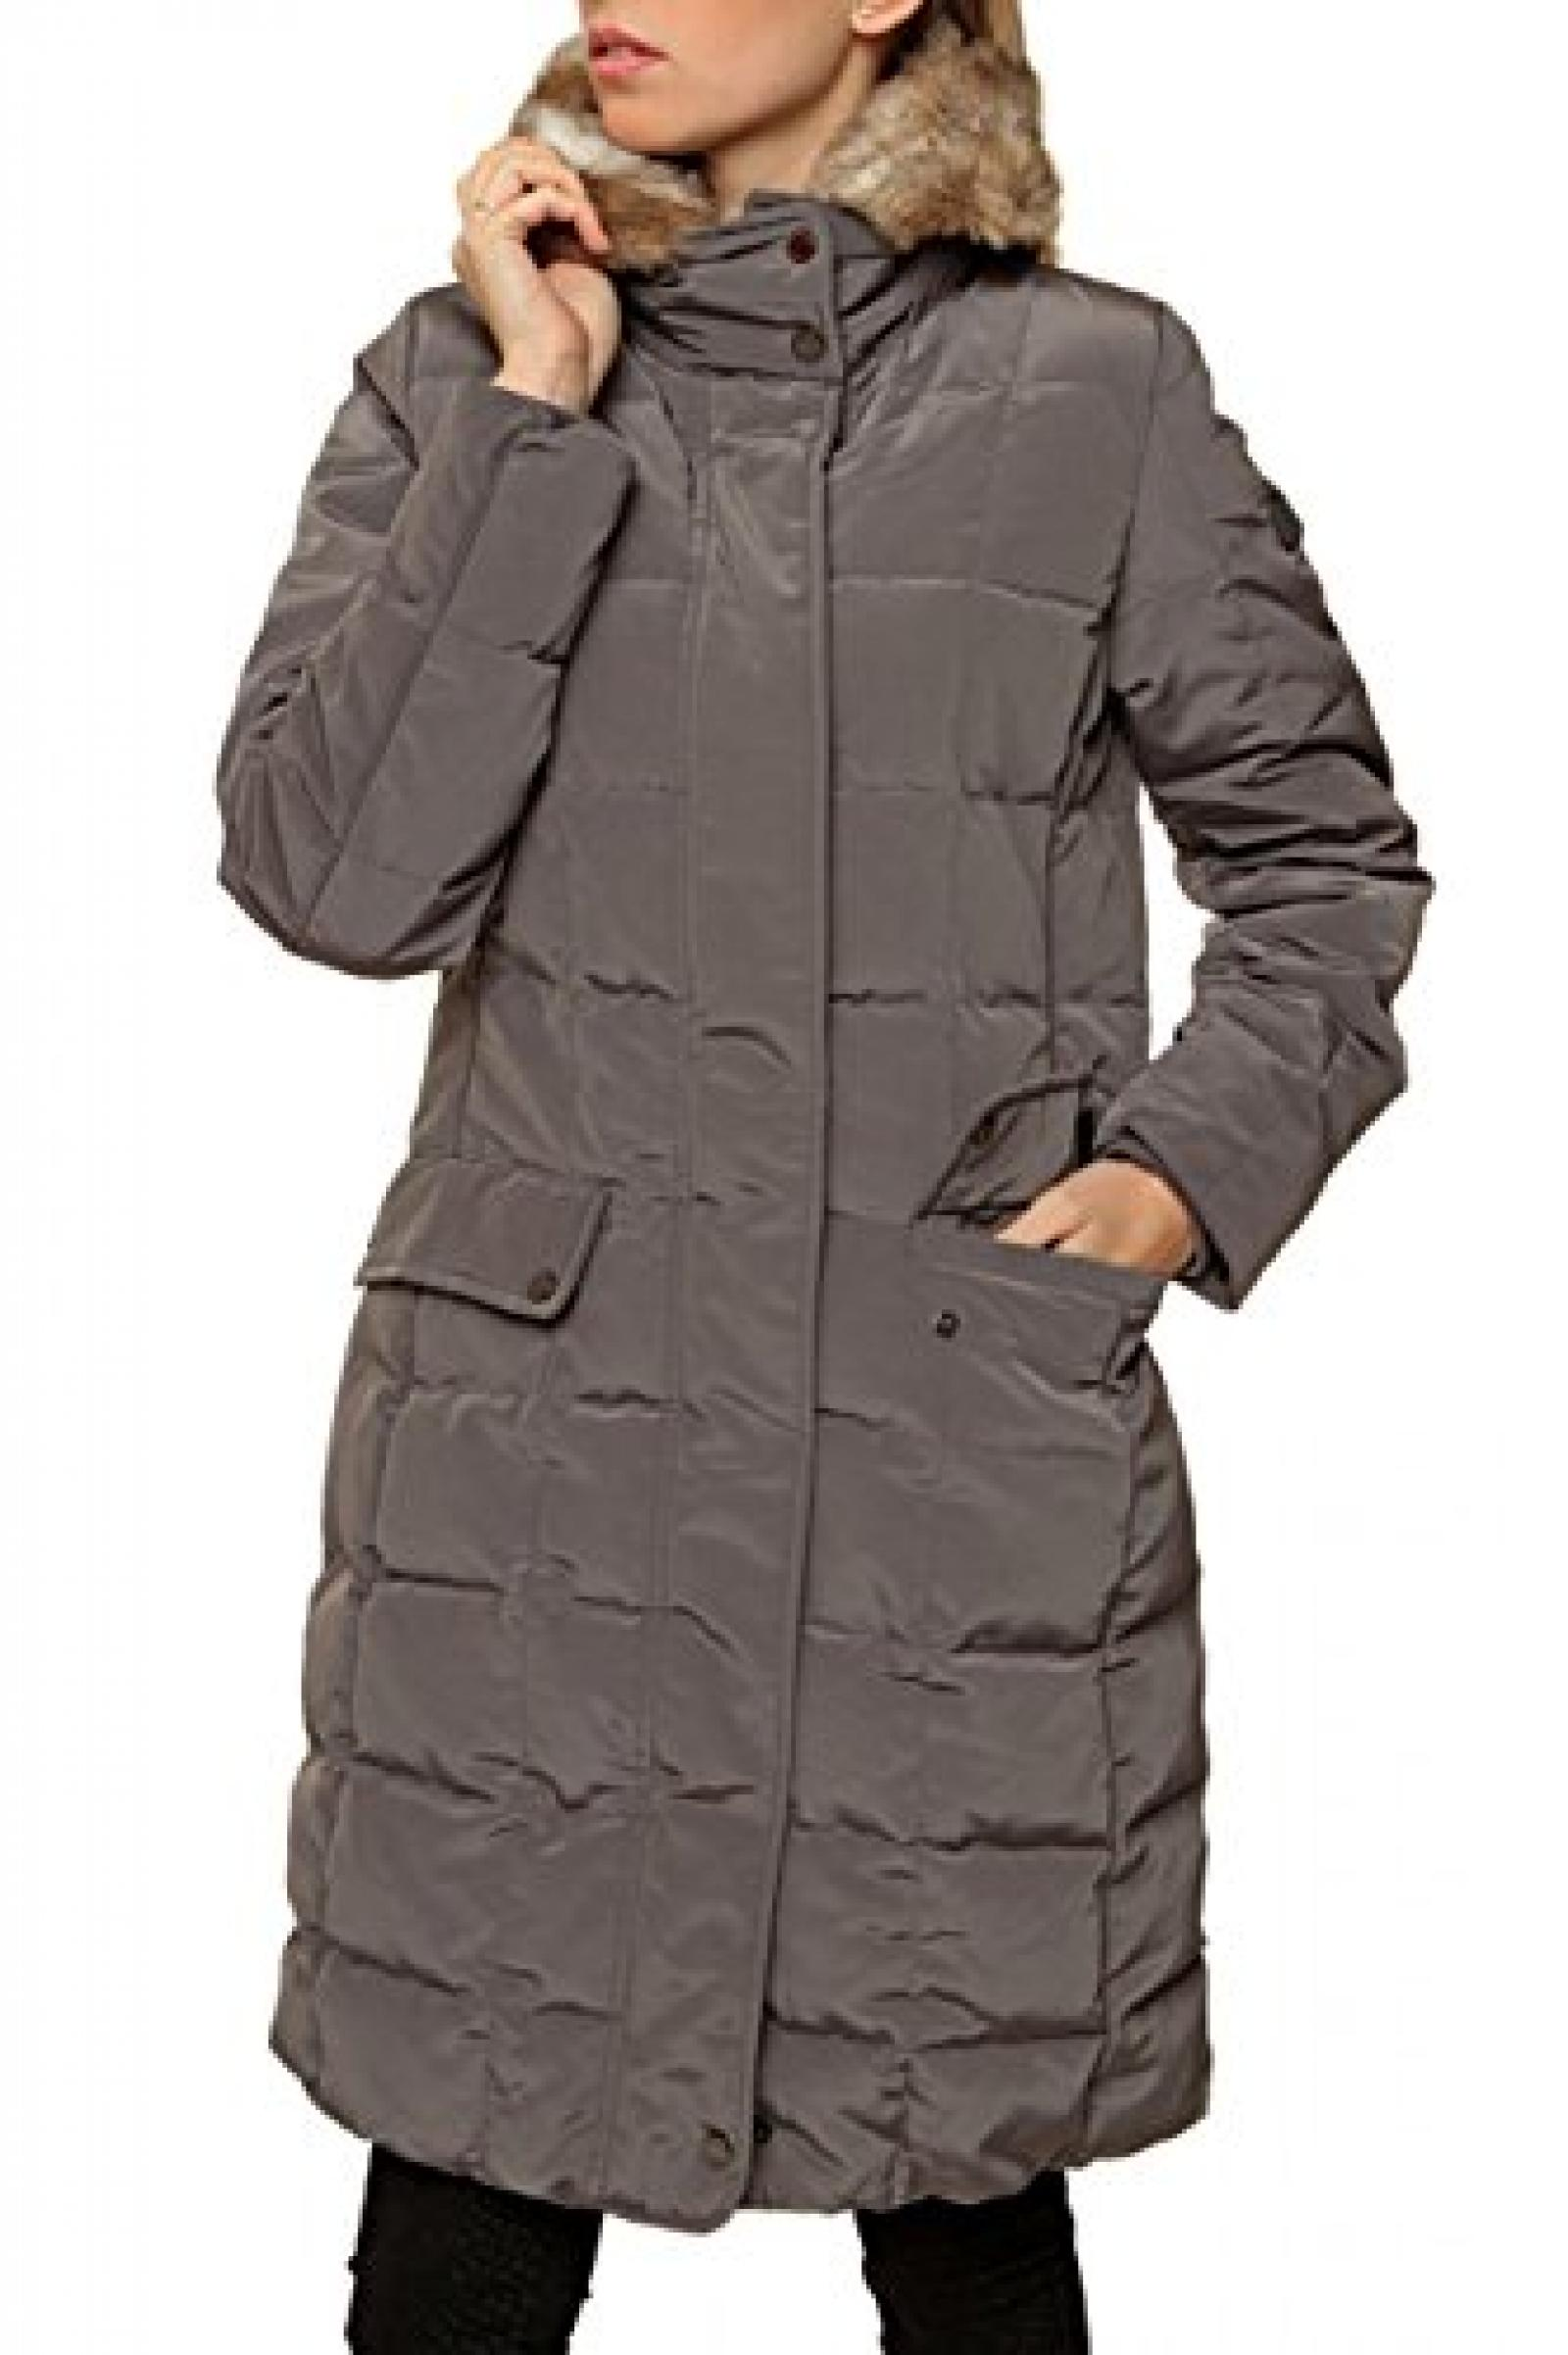 Geox Damen Jacke Daunenjacke , Farbe: Grau